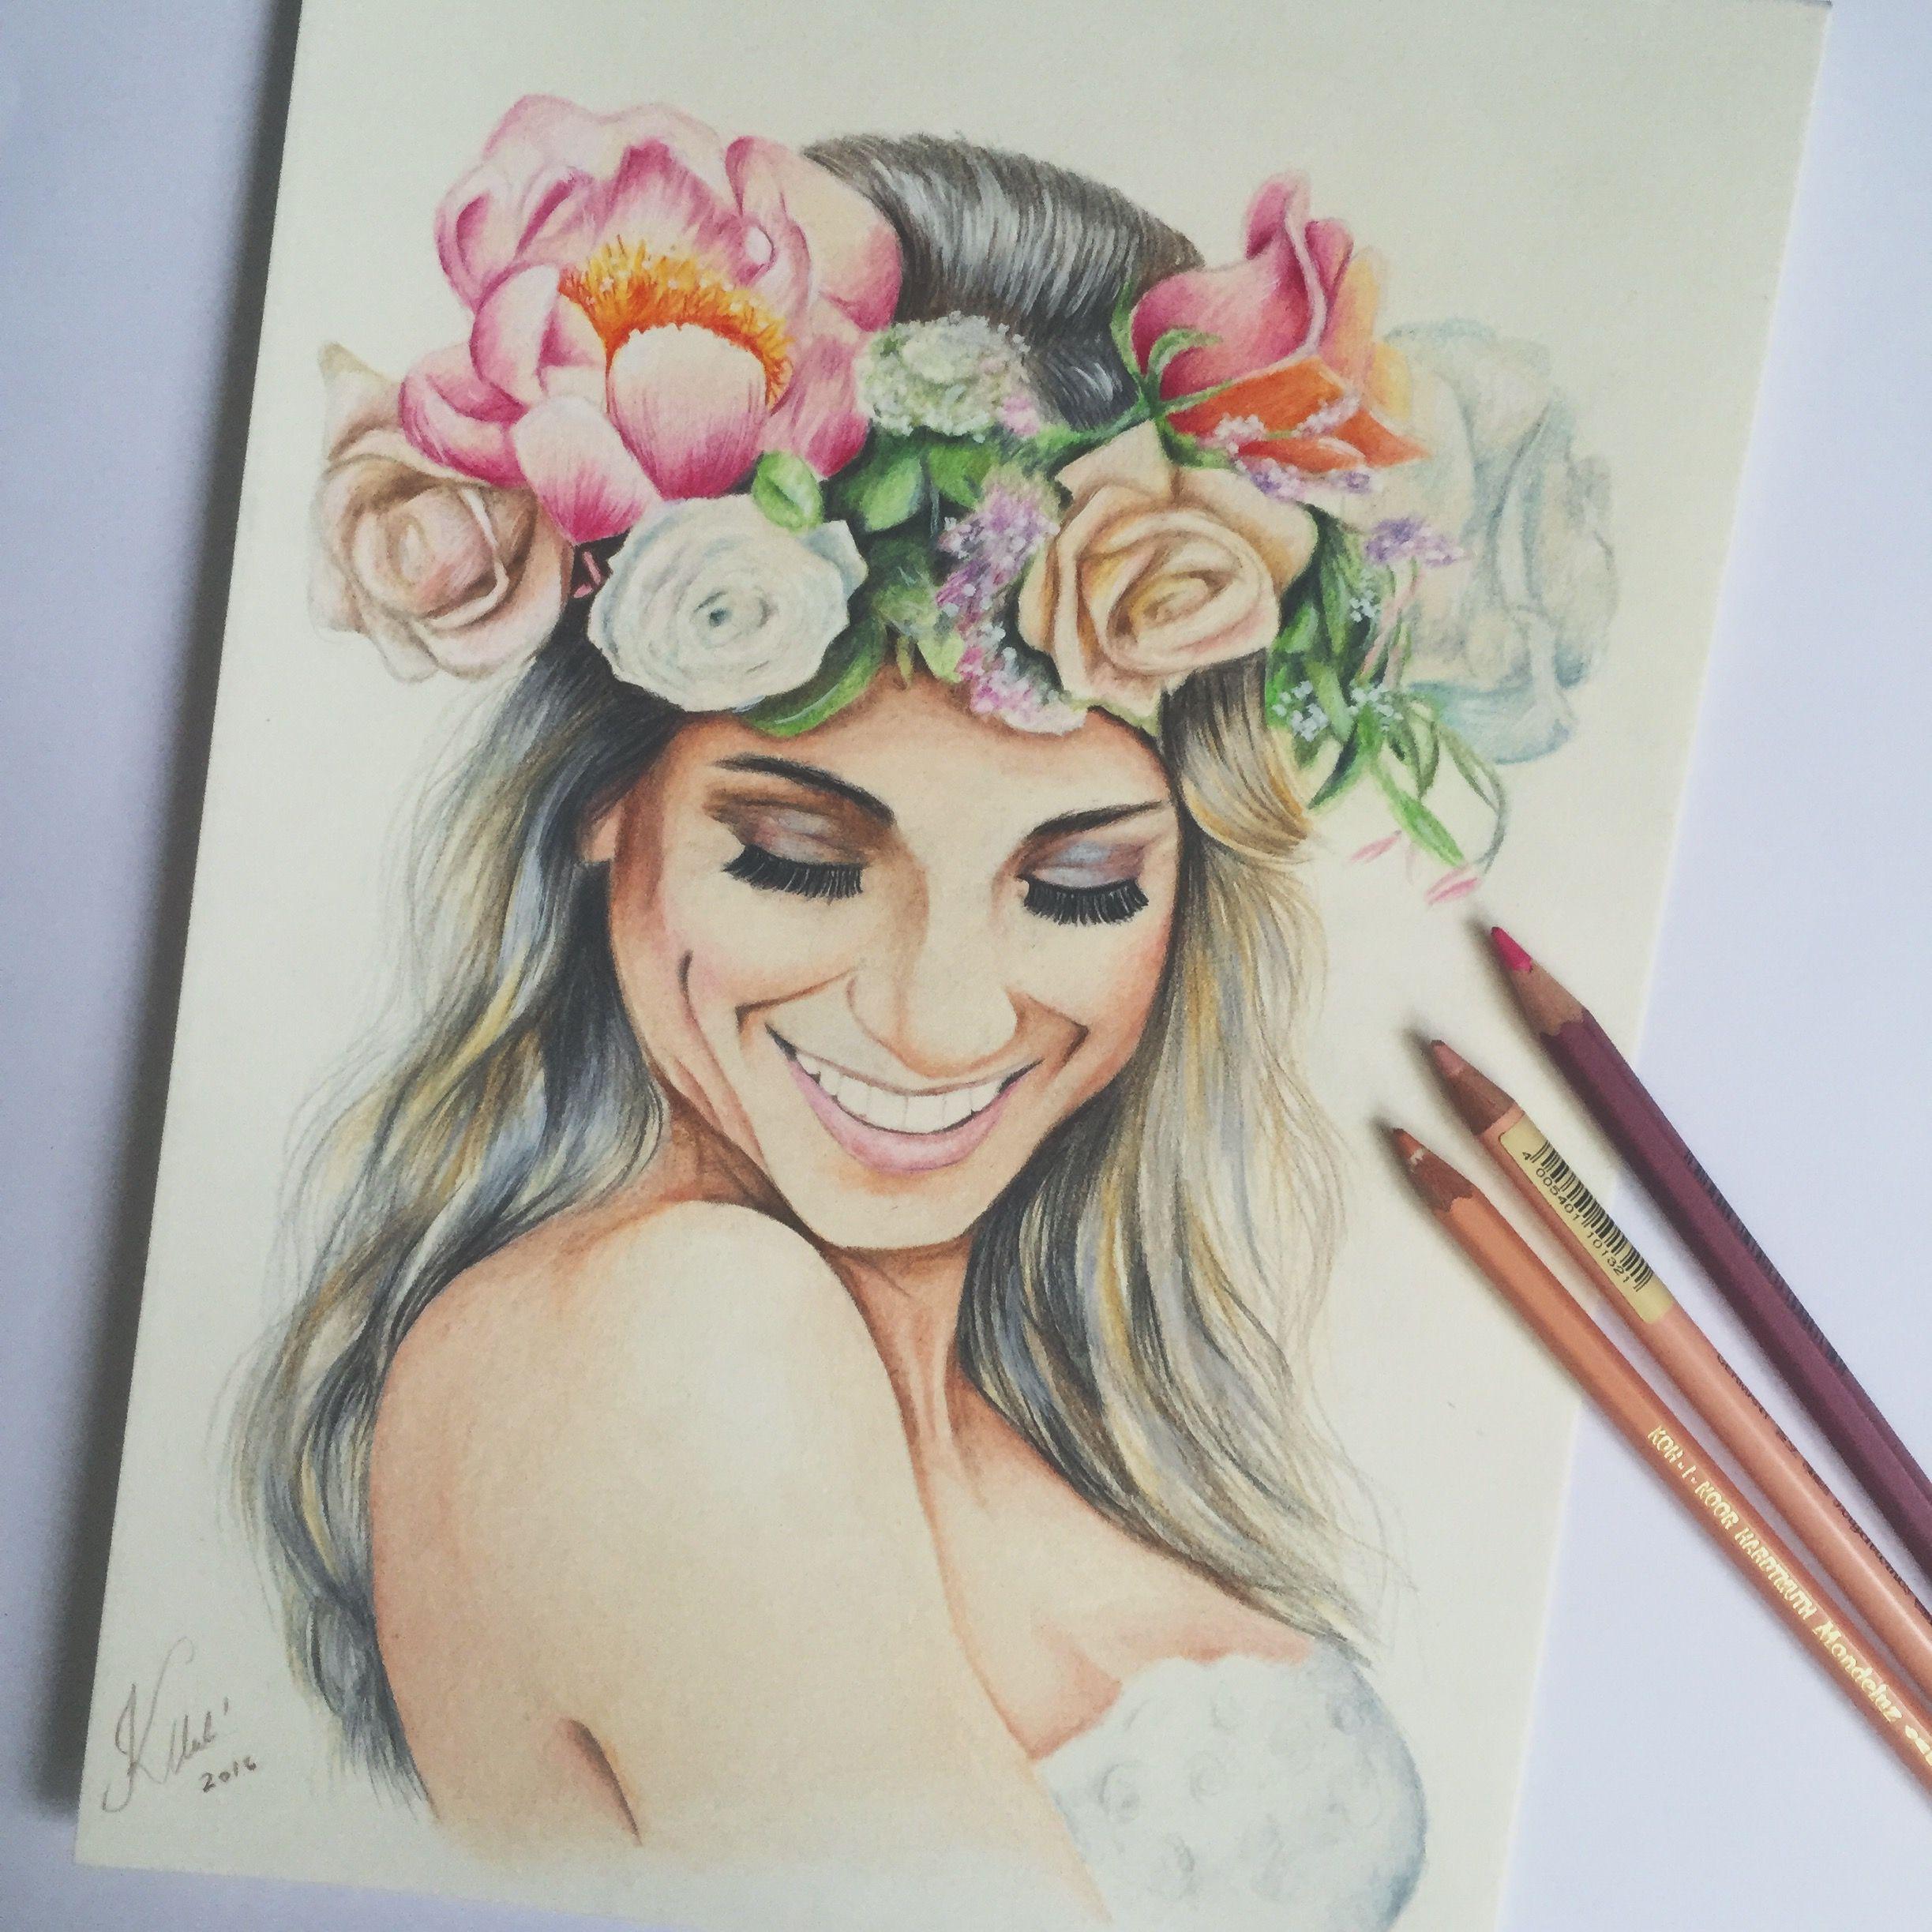 Wedding Hairstyles Drawing: Flower Woman Flowerwrap Colored Pencils Drawing Romantic